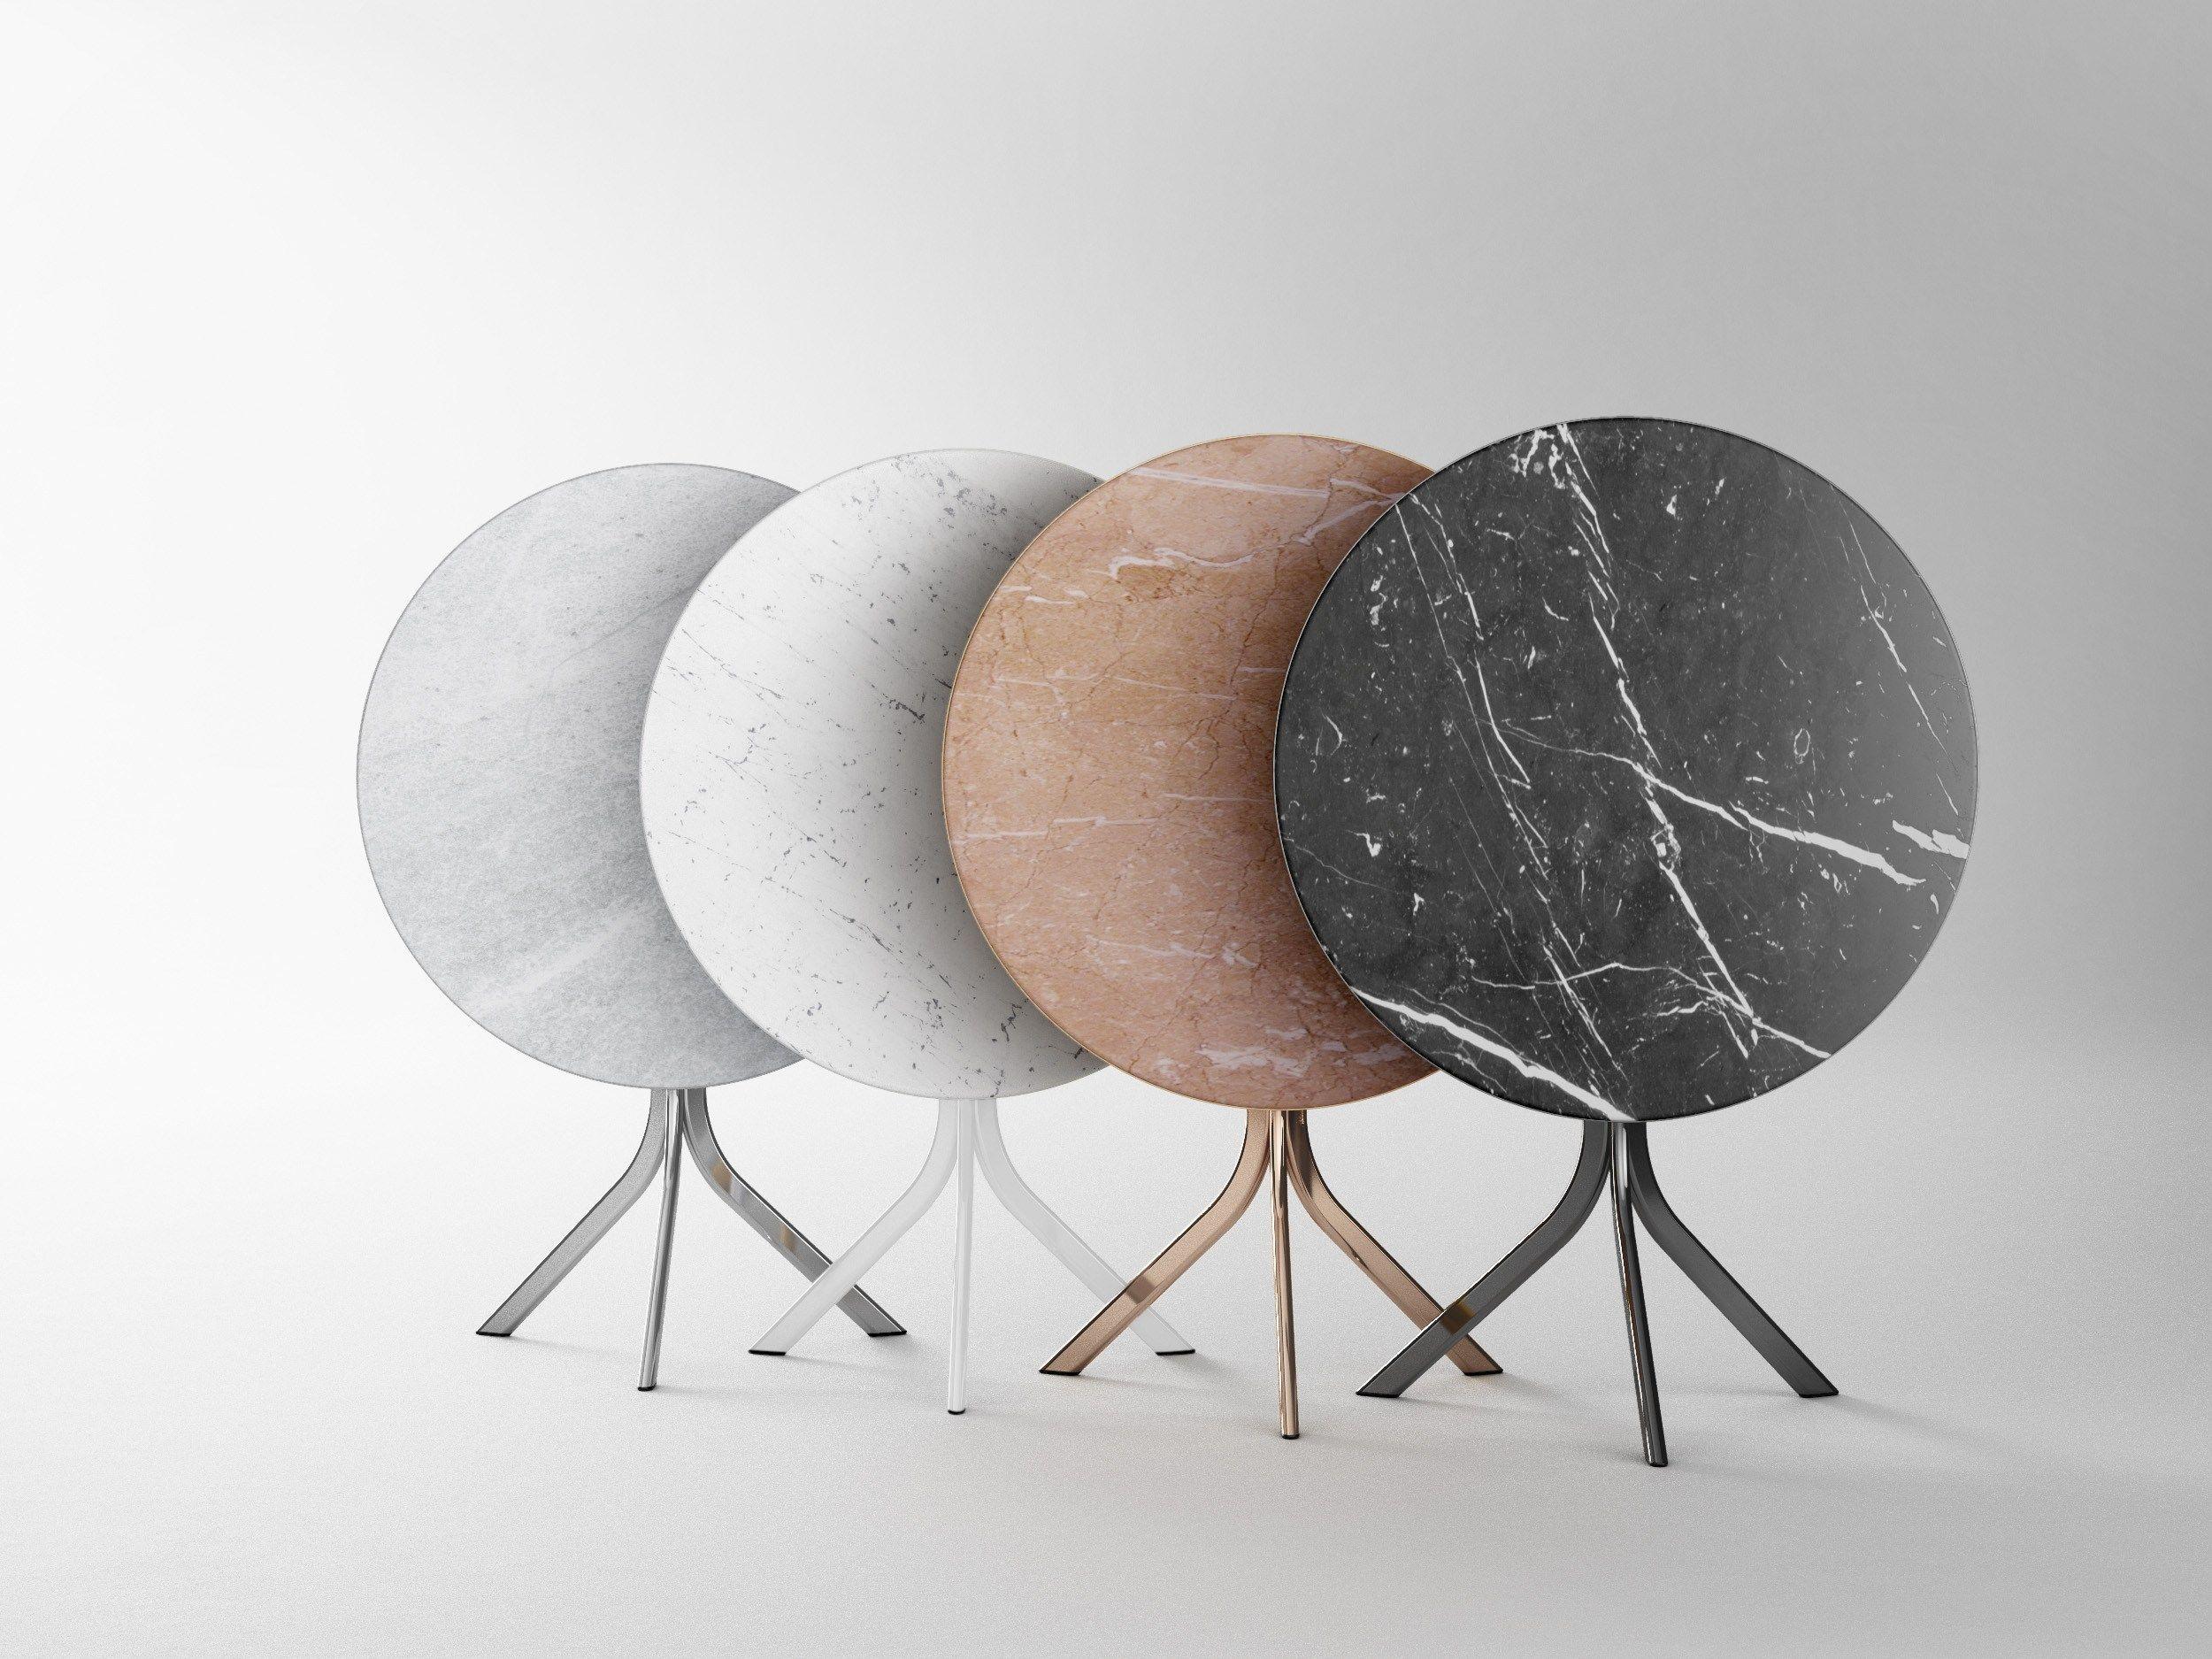 Bistro Dining Table By Jean Louis Iratzoki For Retegui Bistro Dining Table Marble Bistro Table Marble Furniture